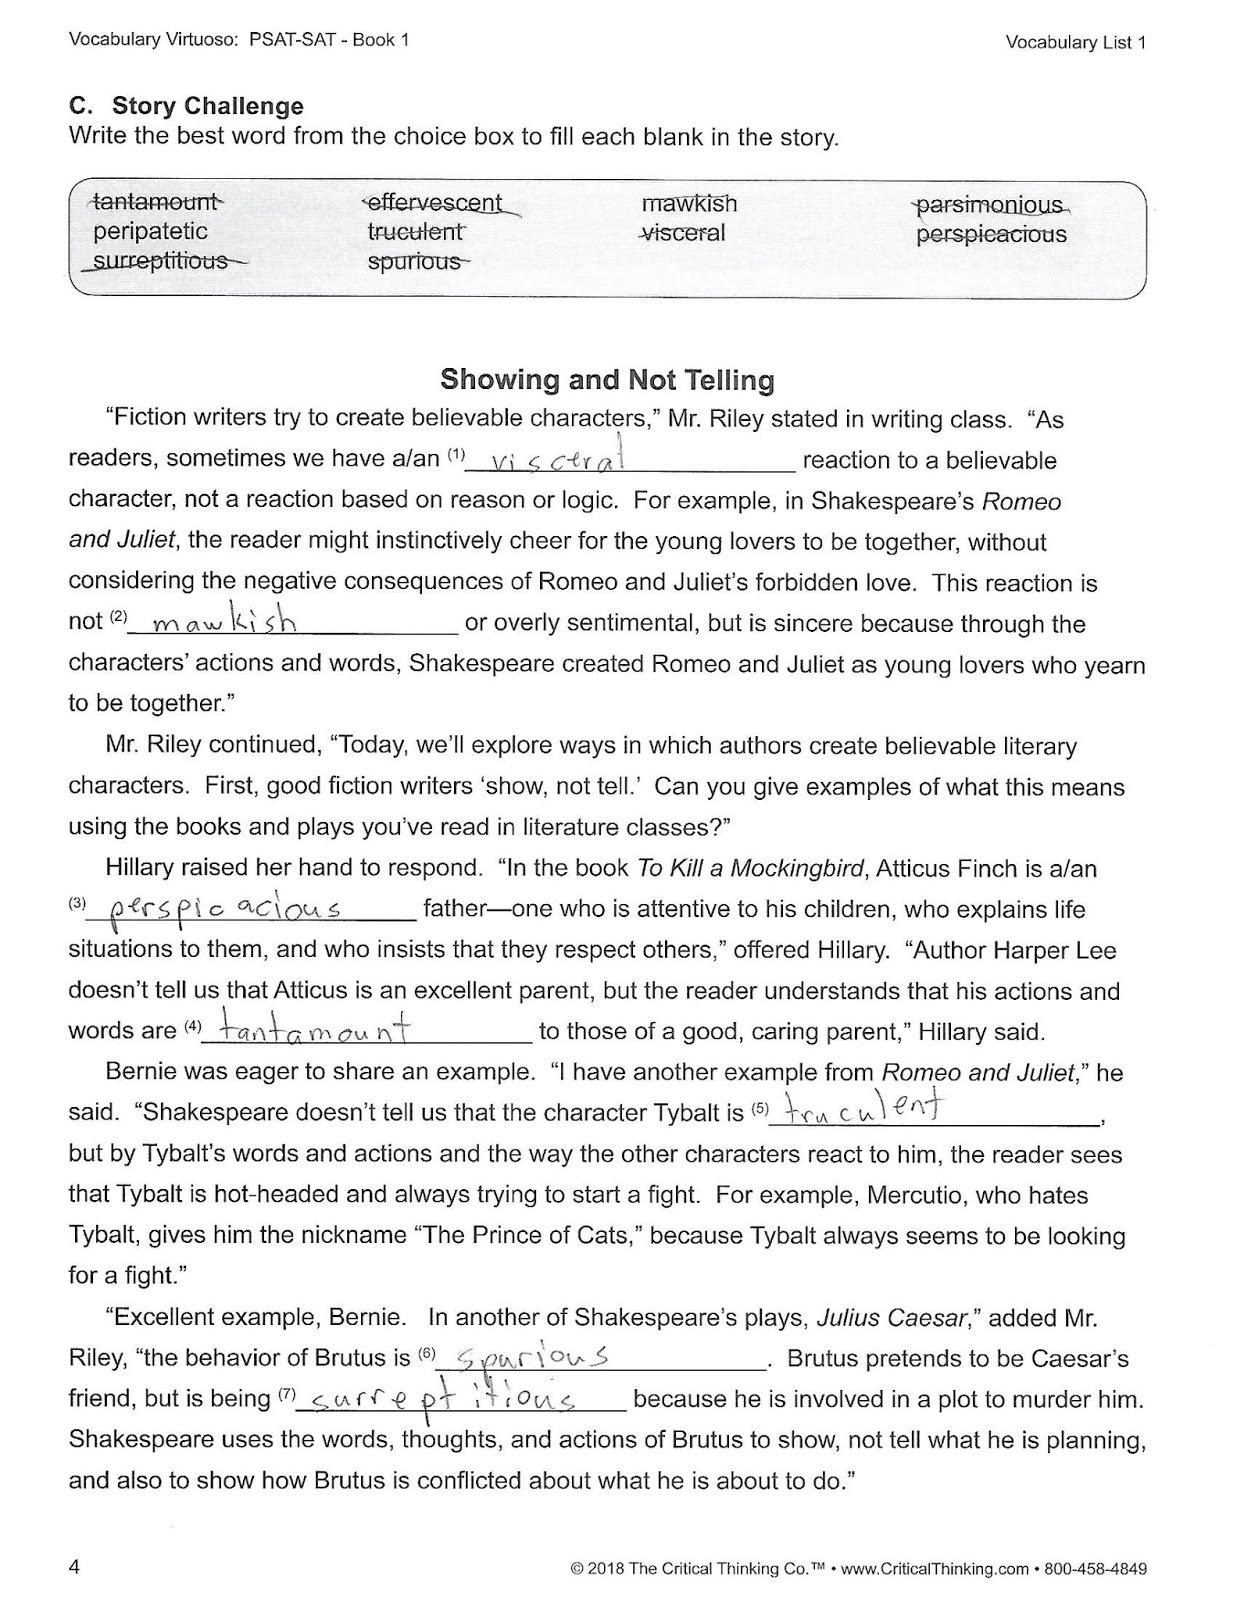 My Happy Homeschool: Vocabulary Virtuoso: PSAT-SAT Book 1